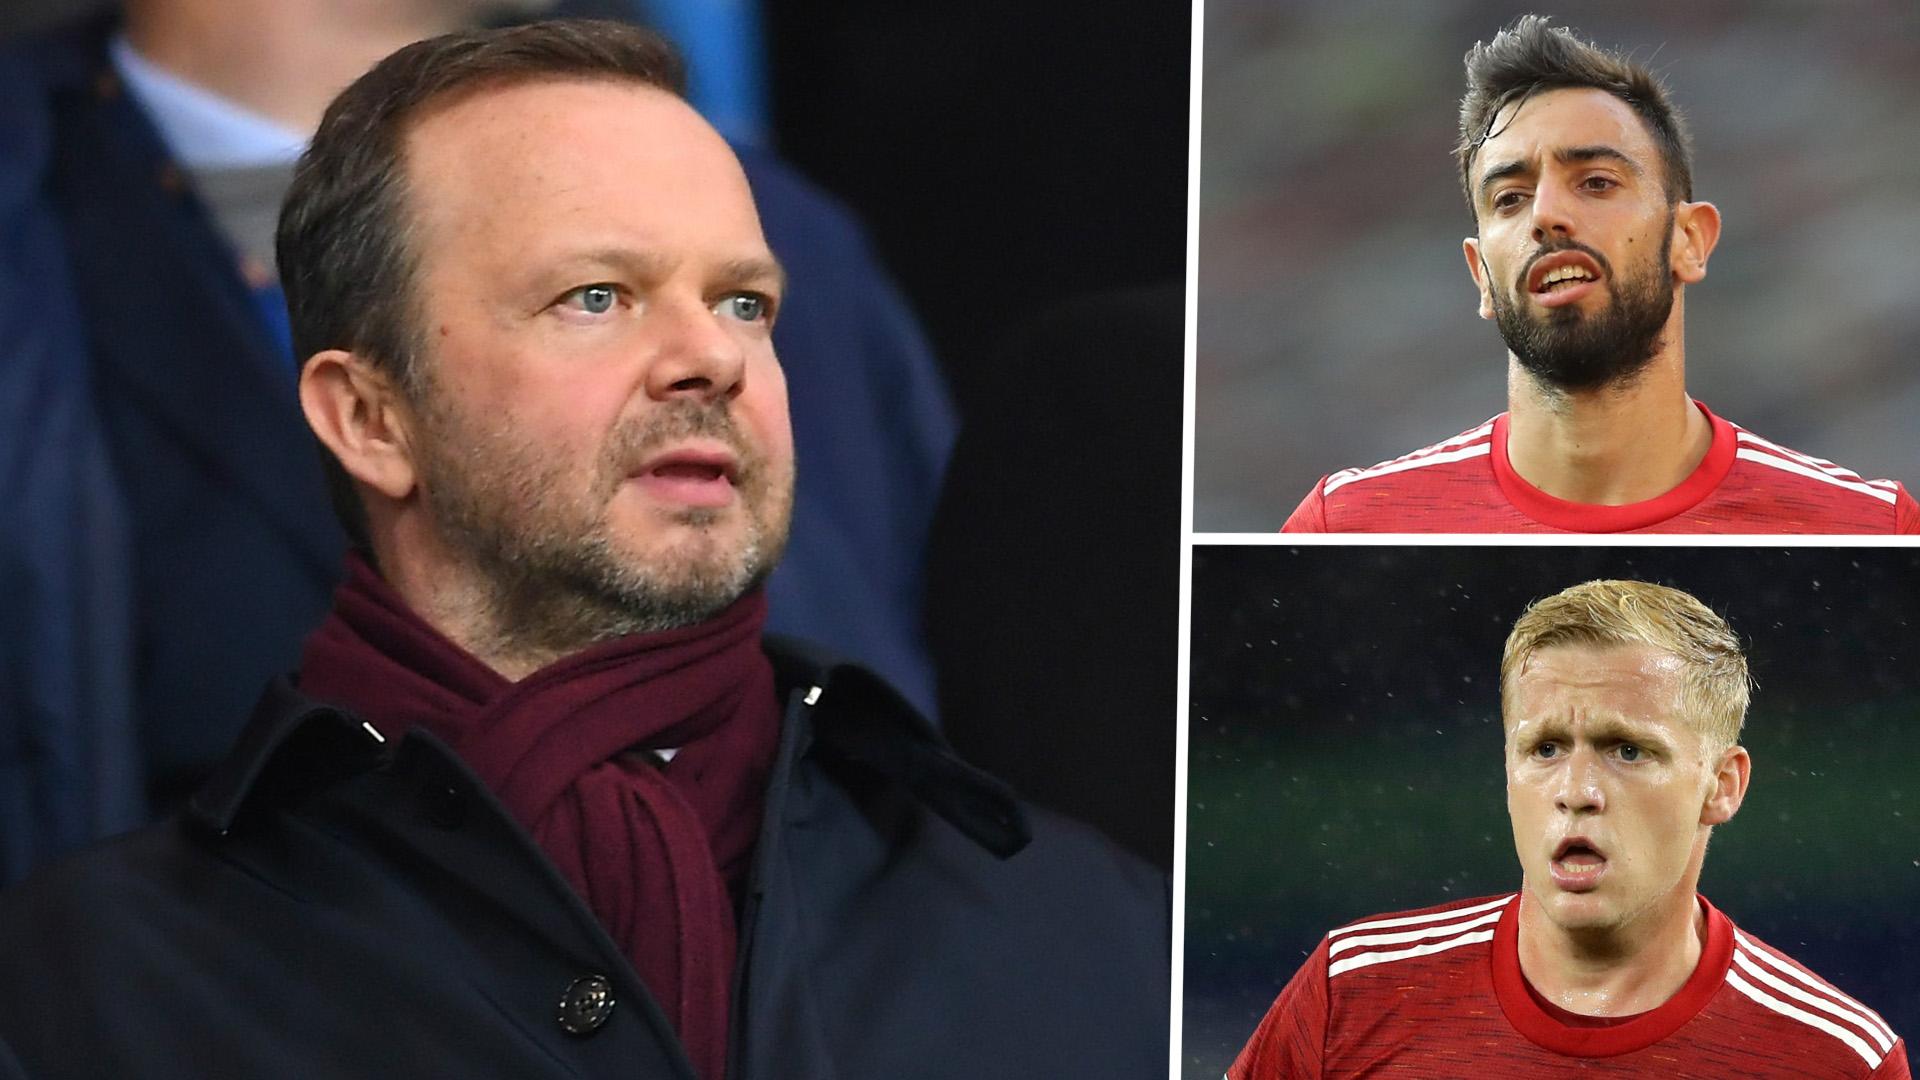 'We've spent more than any other European club!' - Woodward defends Man Utd's transfer activity backs Solskjaer